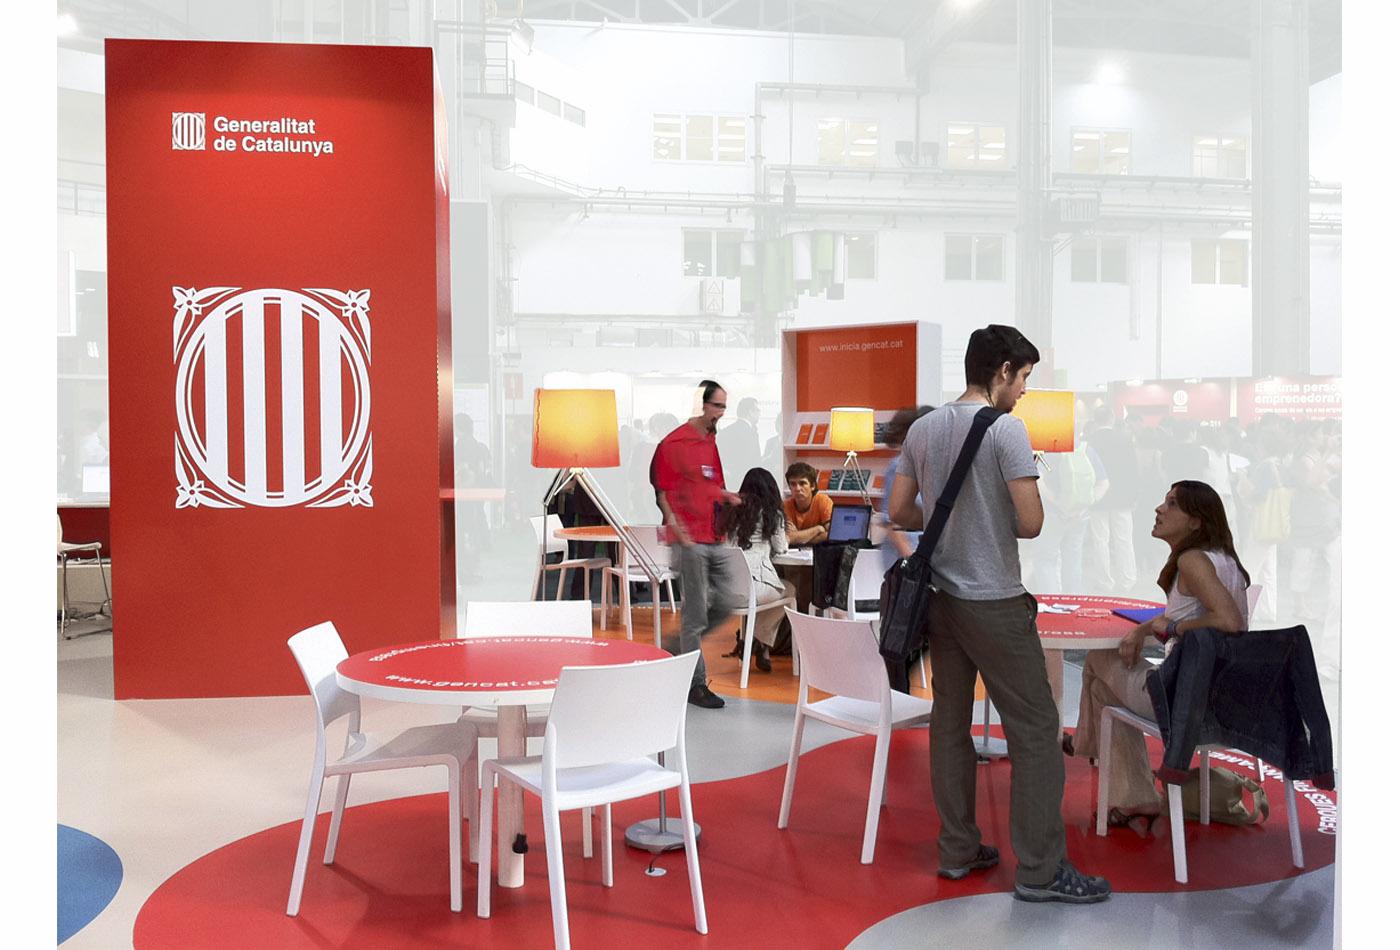 emprendedor-creartiva-stand-evento-feria- bussiness-congreso-disseny-grafic-barcelona-generalitat-catalunya